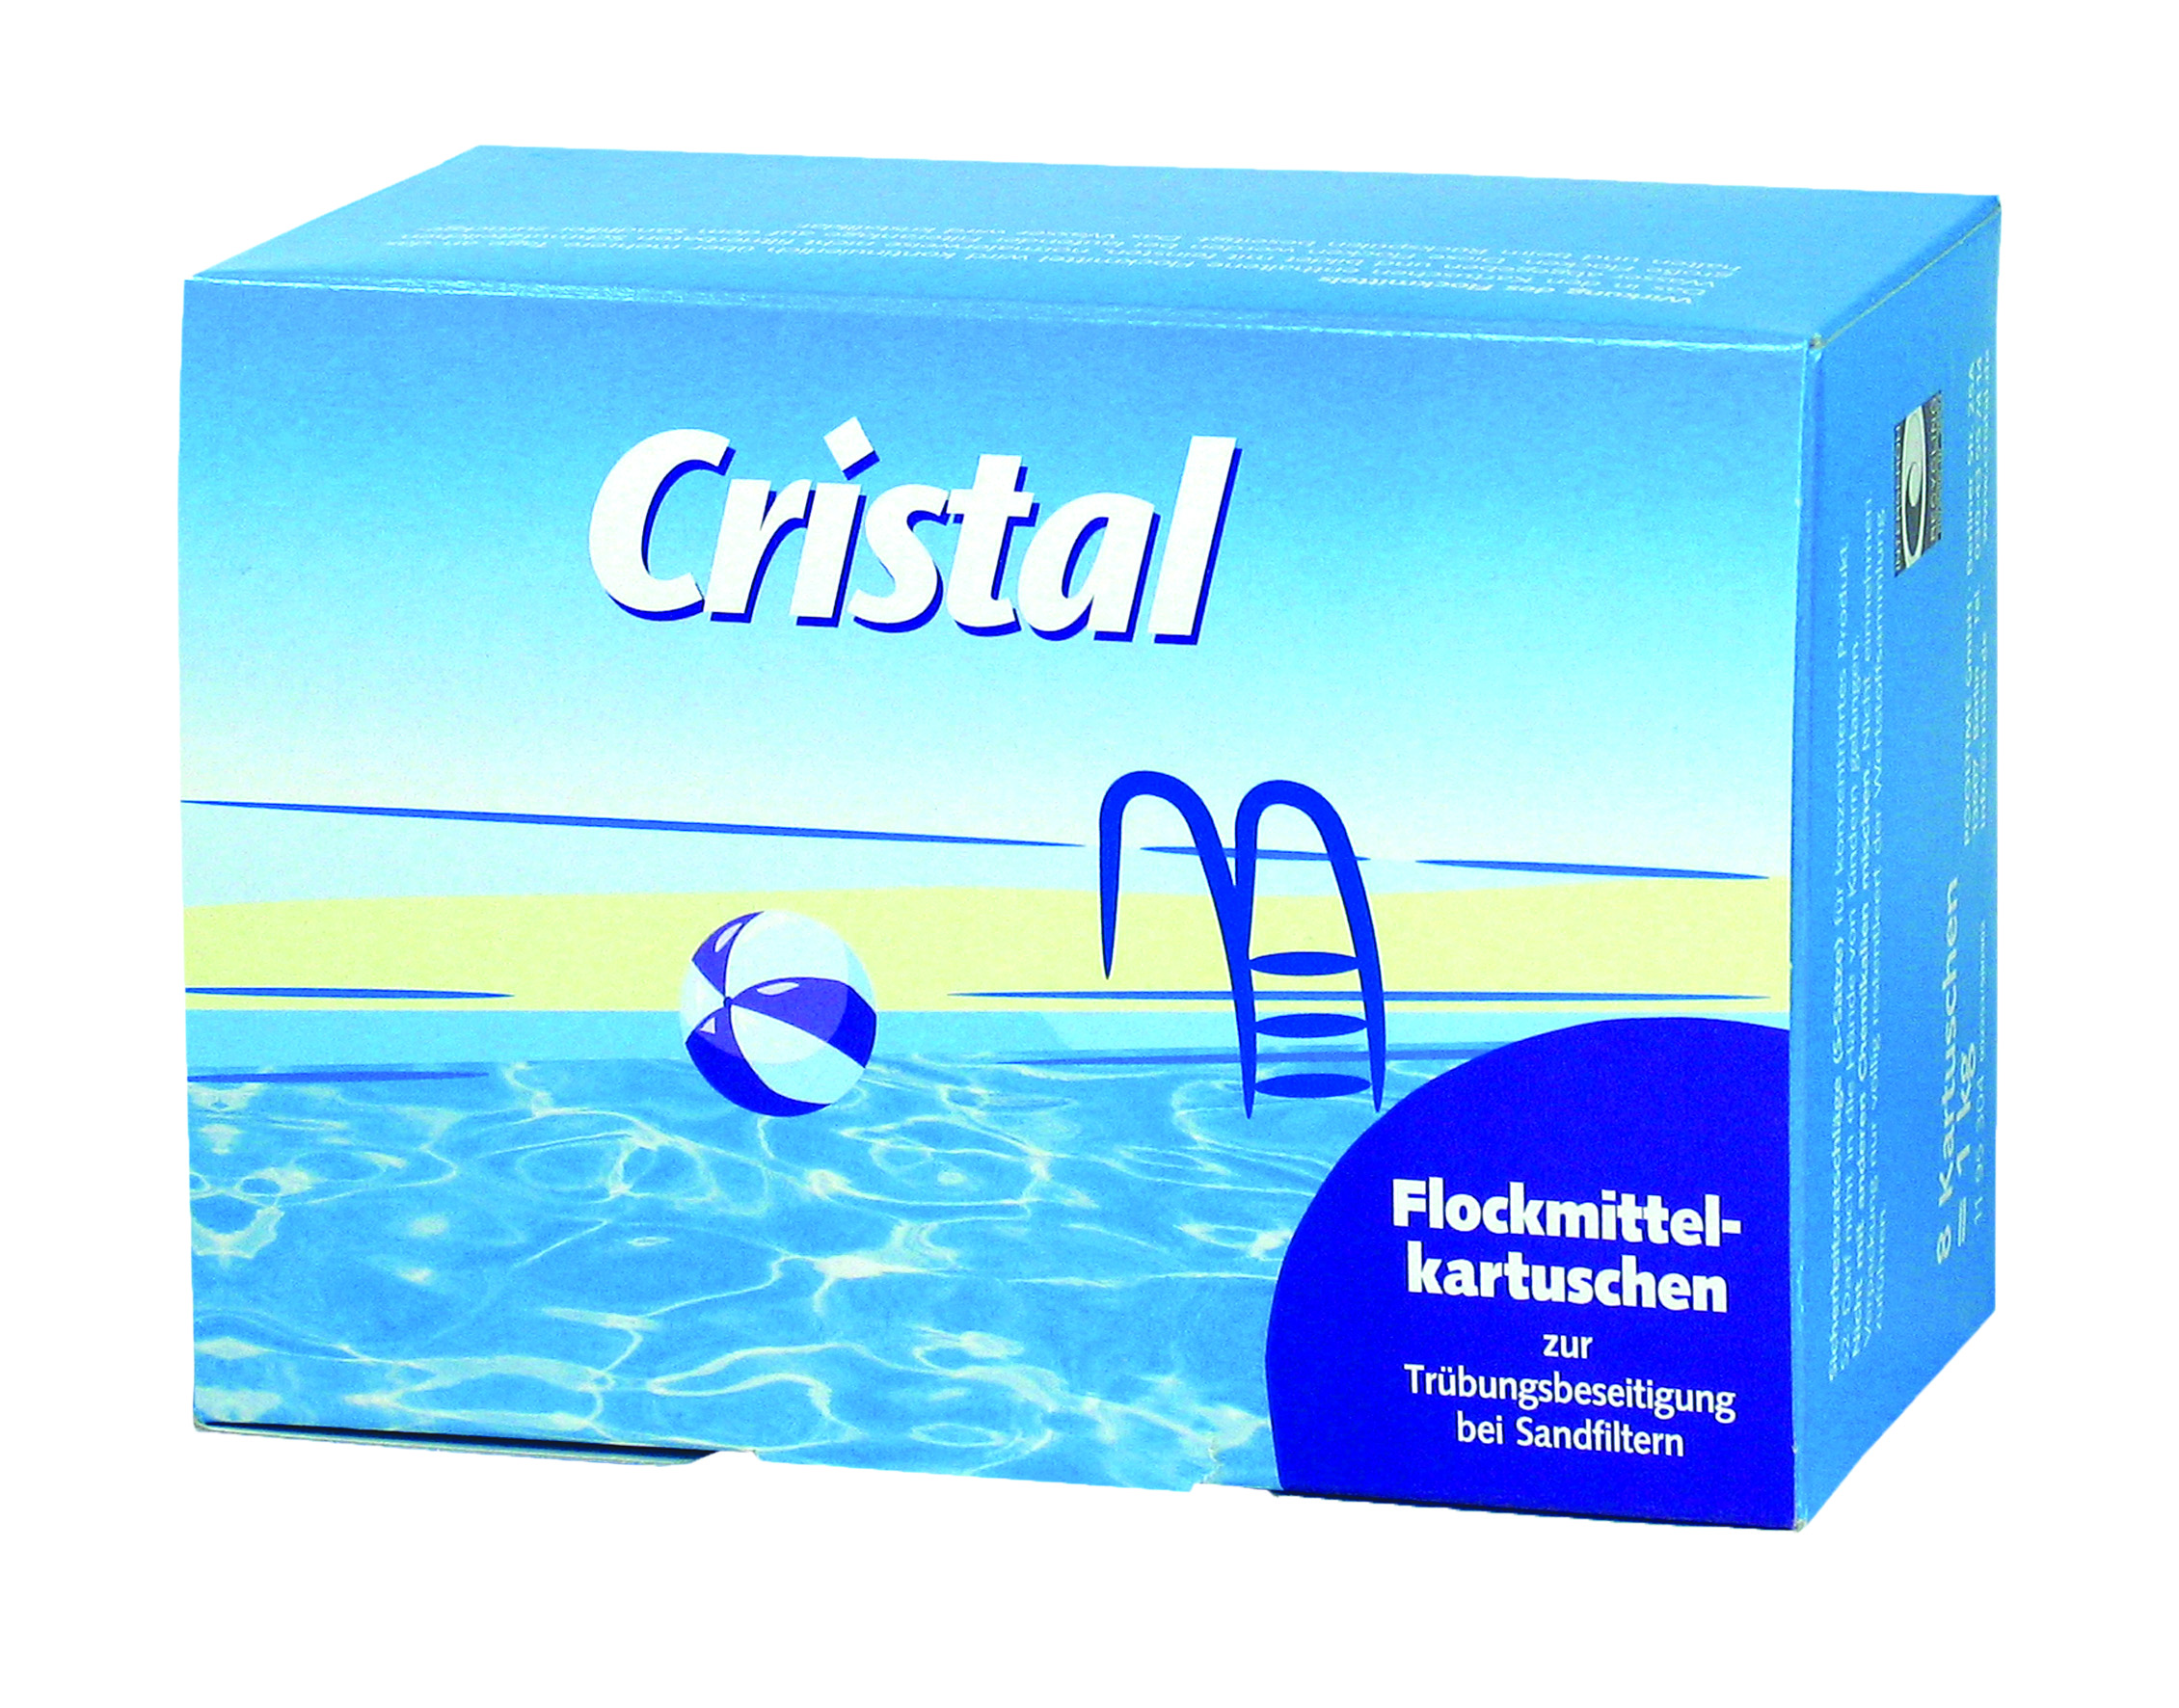 Cristal Flockmittelkartusche